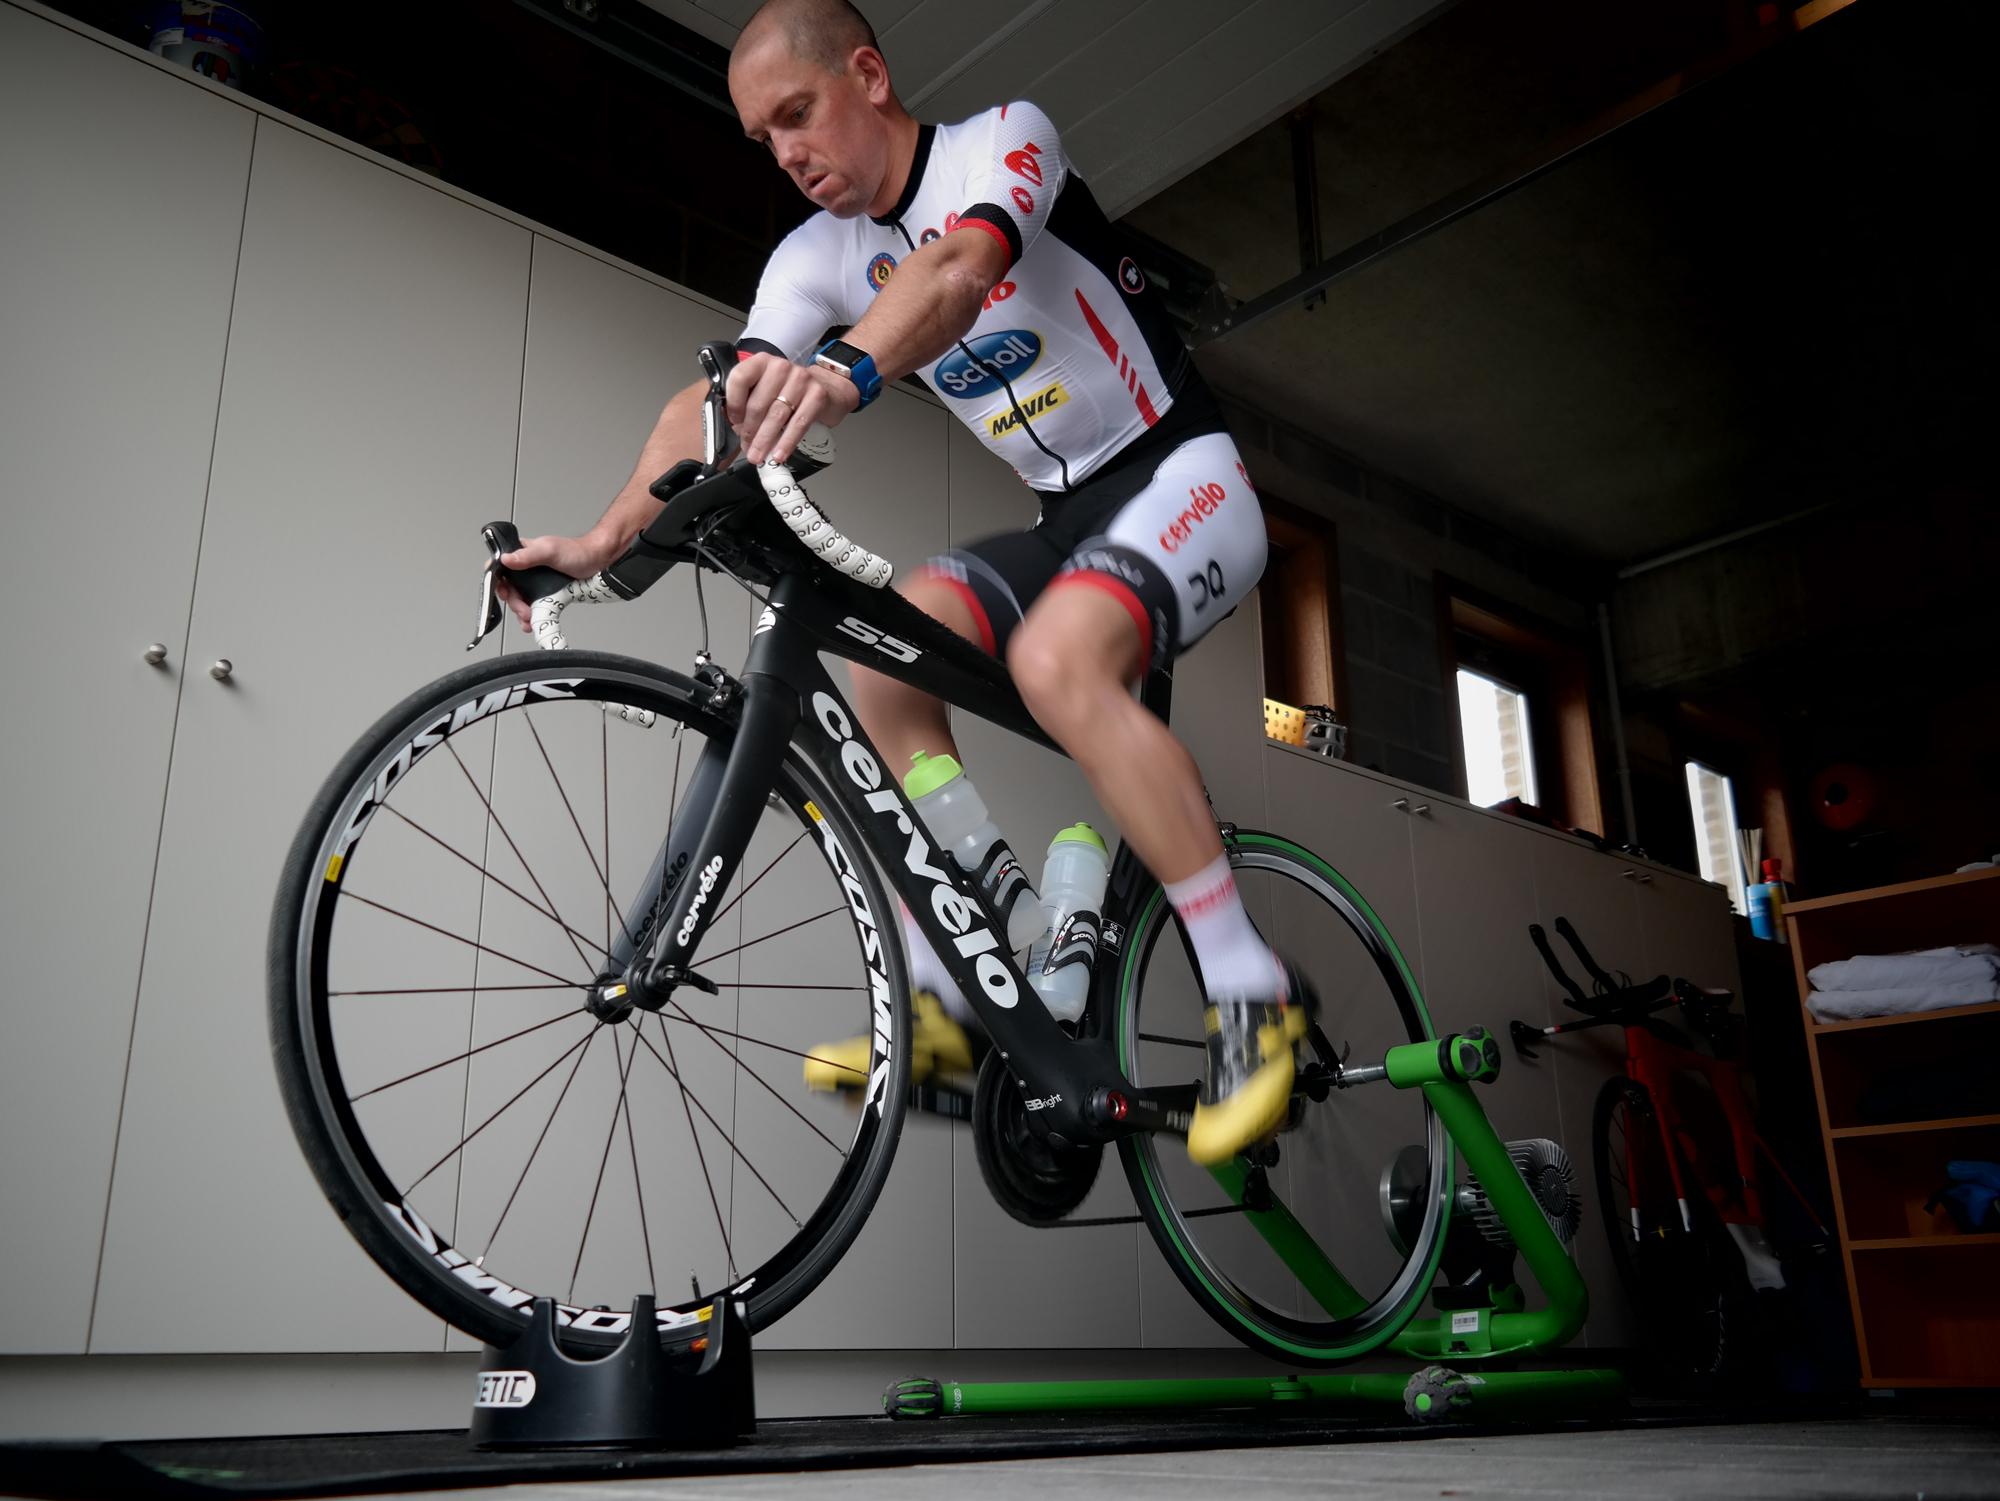 FVL_Recovery-Training-Ride.jpg